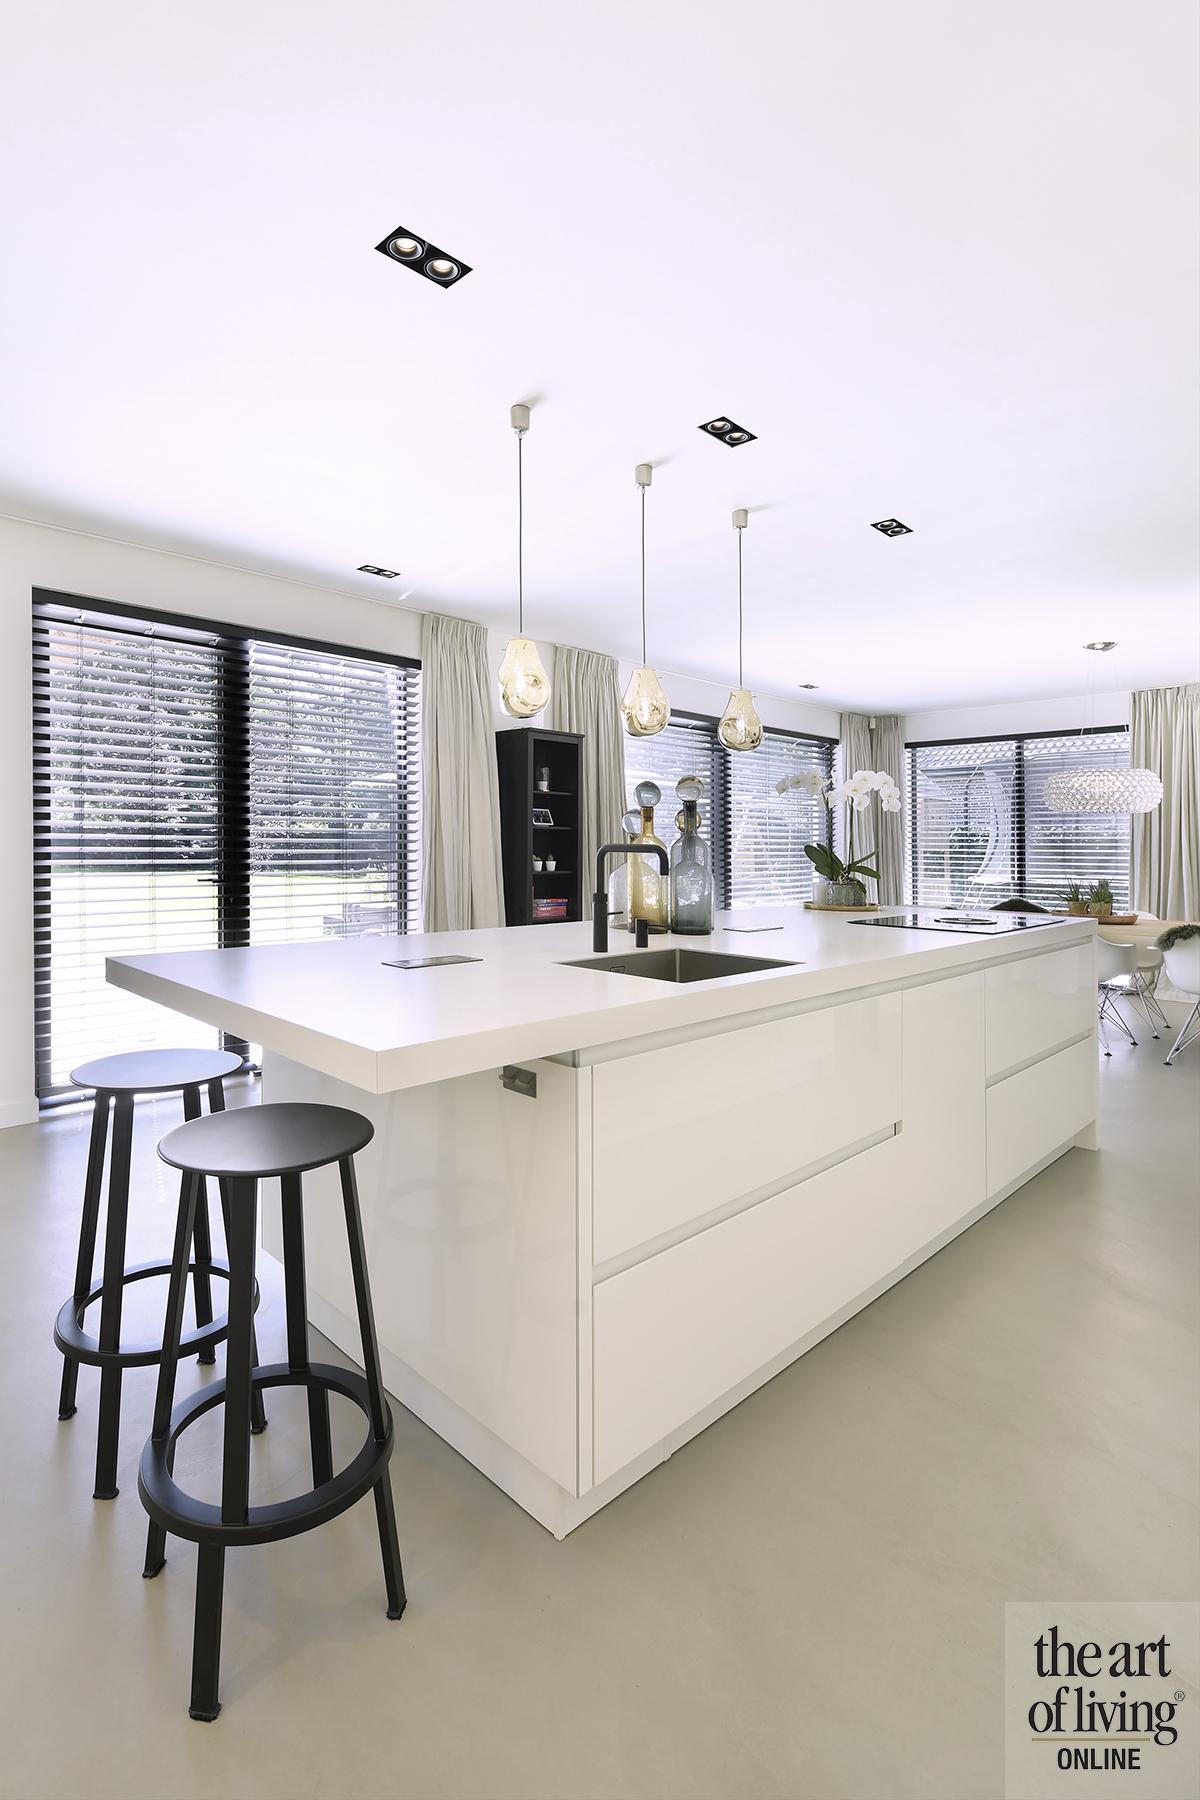 Moderne architectuur, Arend Groenewegen Architect BNA, the art of living